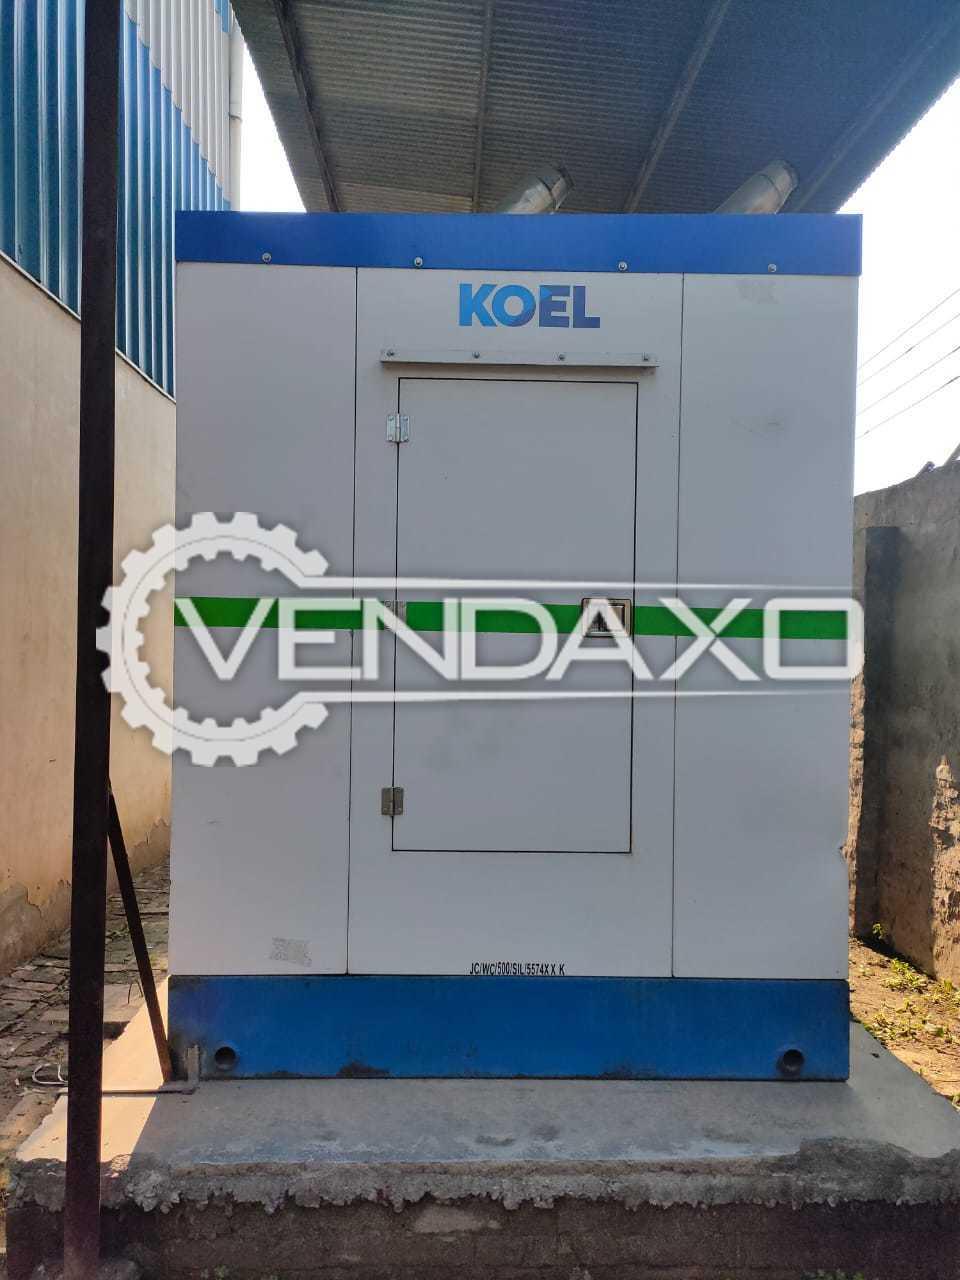 KOEL Diesel Generator - 500 Kva, 2015 Model